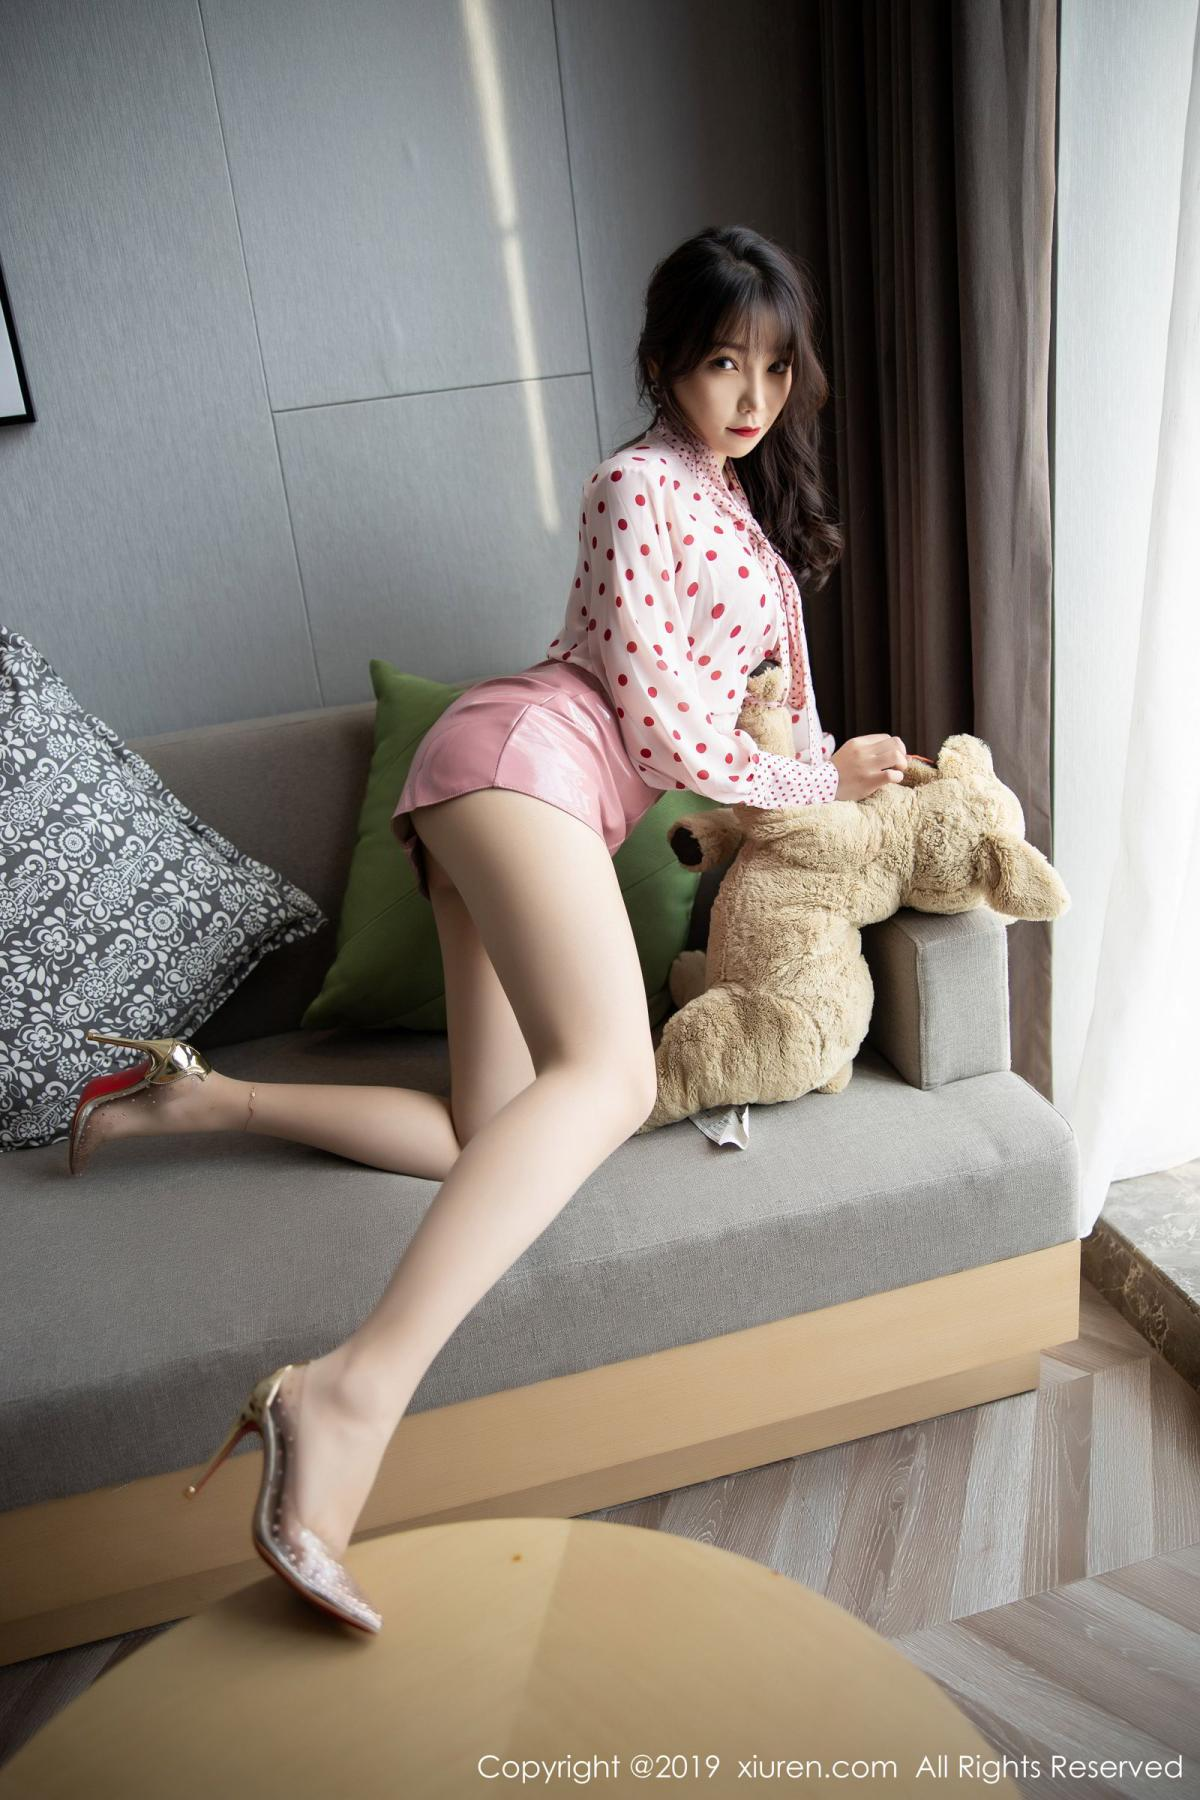 [XiuRen] Vol.1742 Chen Zhi 41P, Chen Zhi, Tall, Underwear, Xiuren